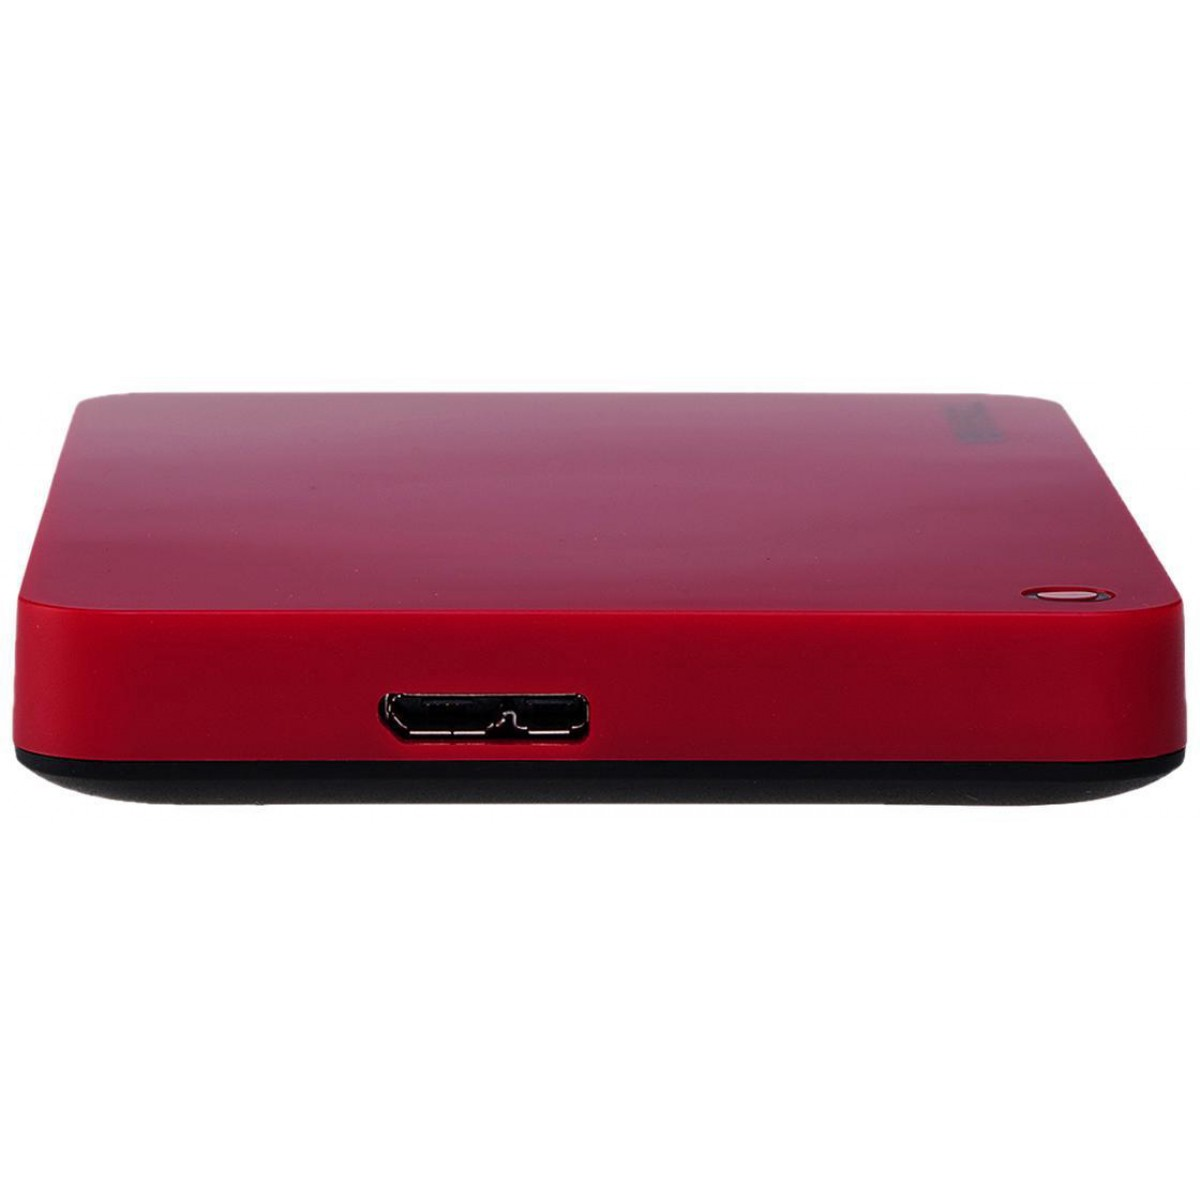 HD Externo Portátil Toshiba Canvio Advance 2TB, USB 3.0, Vermelho, HDTC920XR3AA